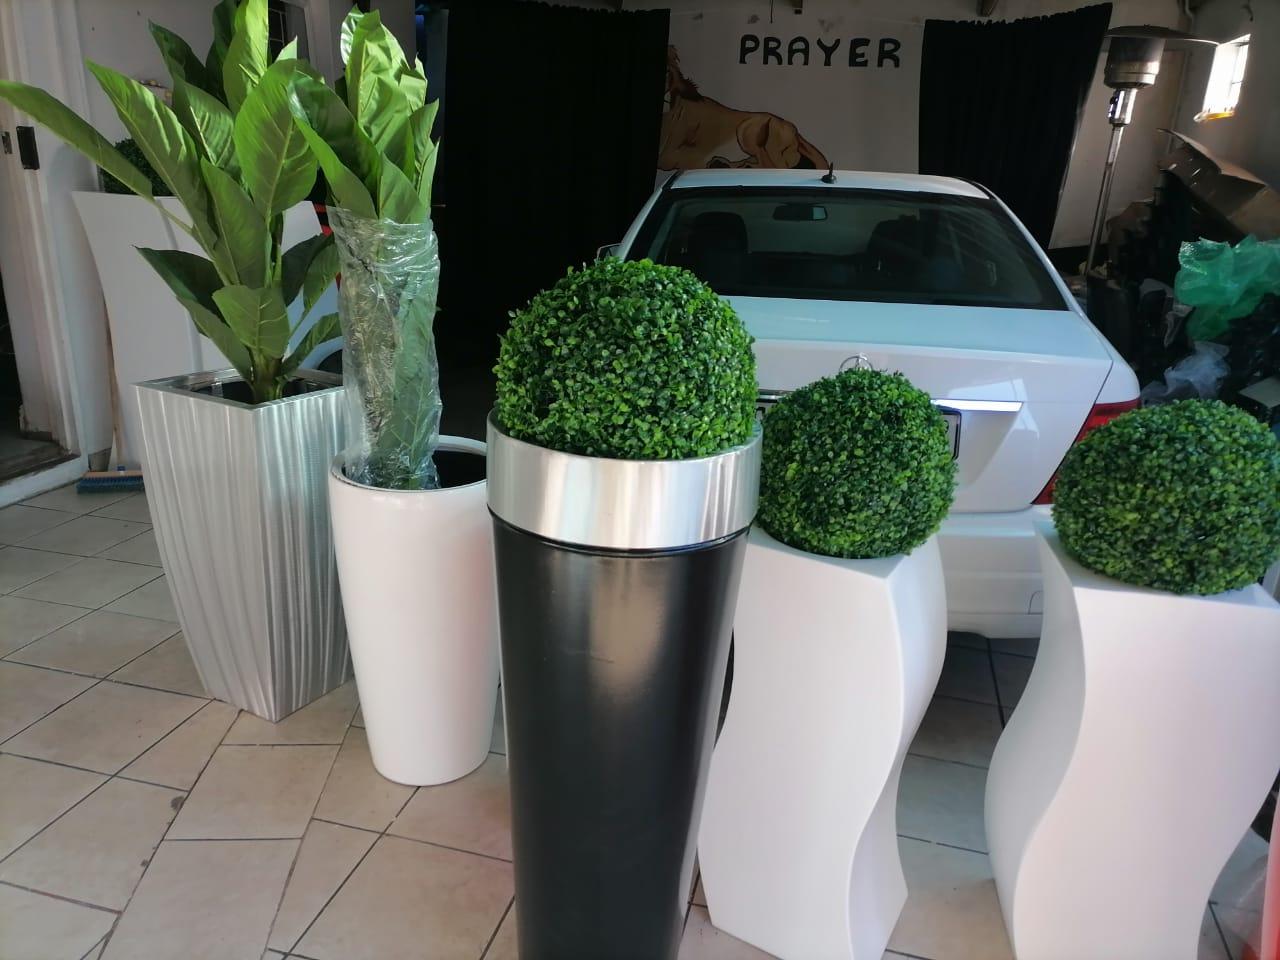 Pots and artificial plants